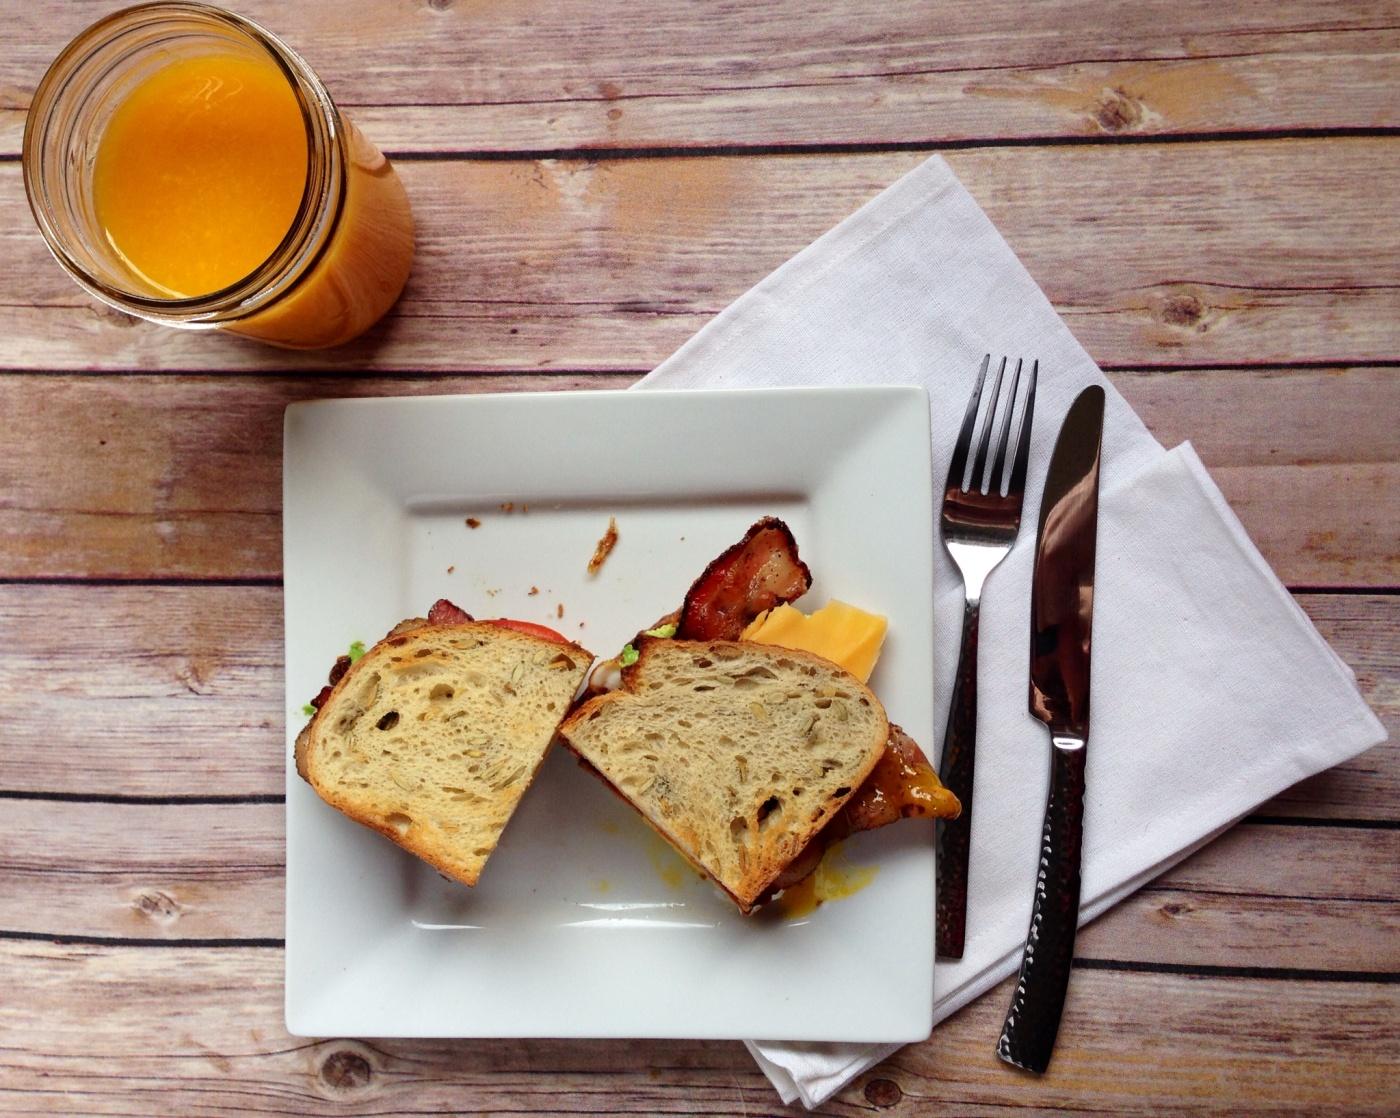 Bfast Sandwich_plate